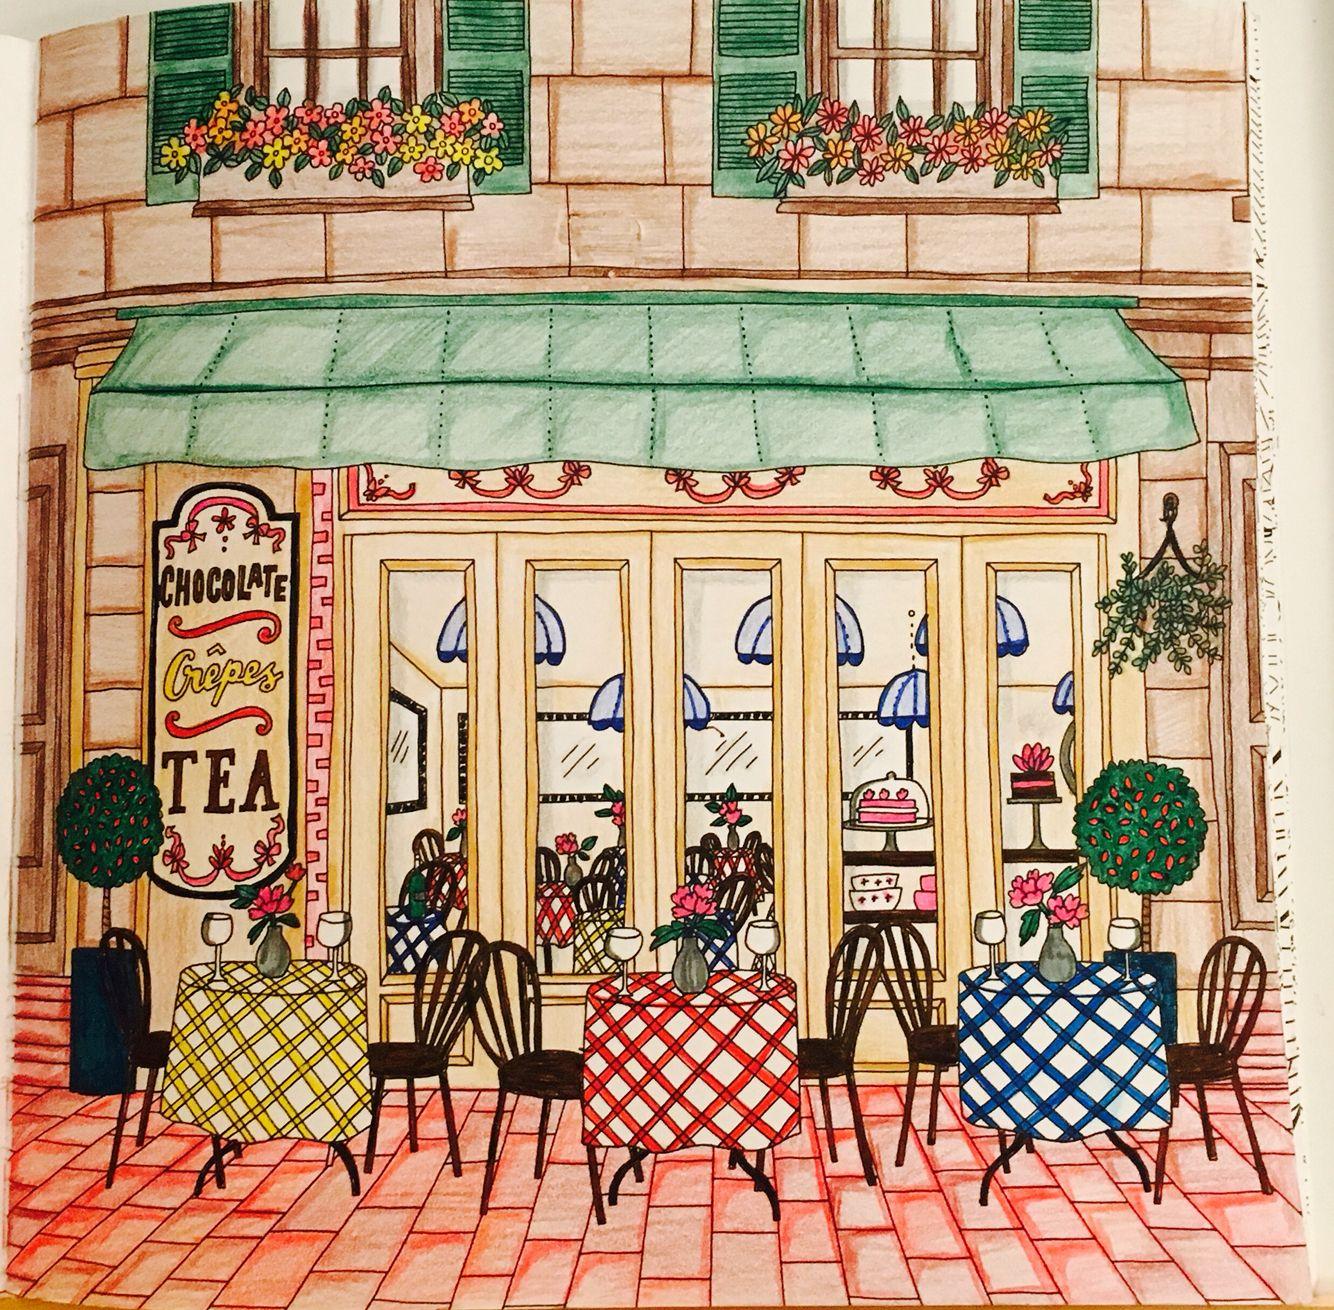 Cafe Colored By Cheryl Krumm Debbie Macomber Coloring Book Debbie Macomber Coloring Books